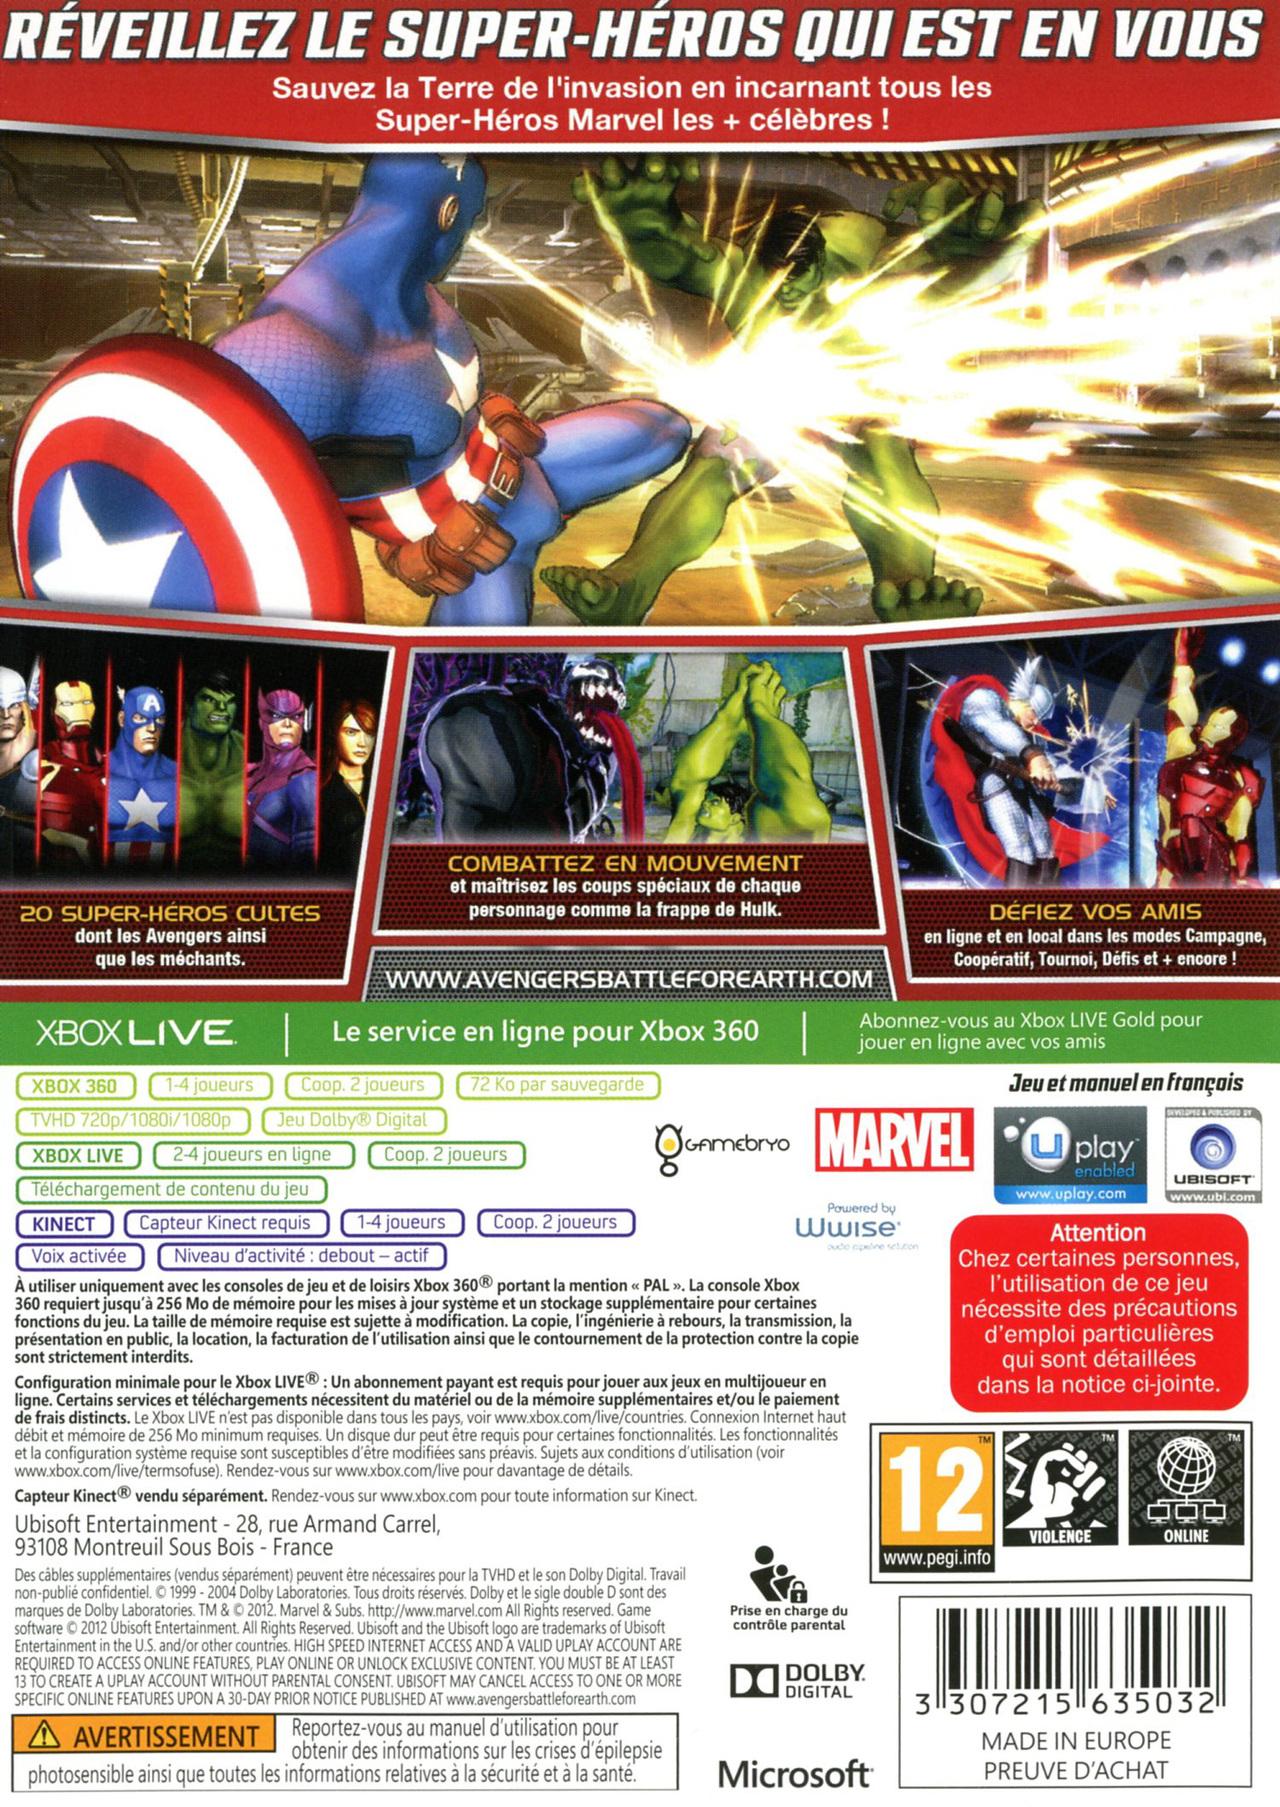 jeuxvideo.com Marvel Avengers : Battle for Earth - Xbox 360 Image 2